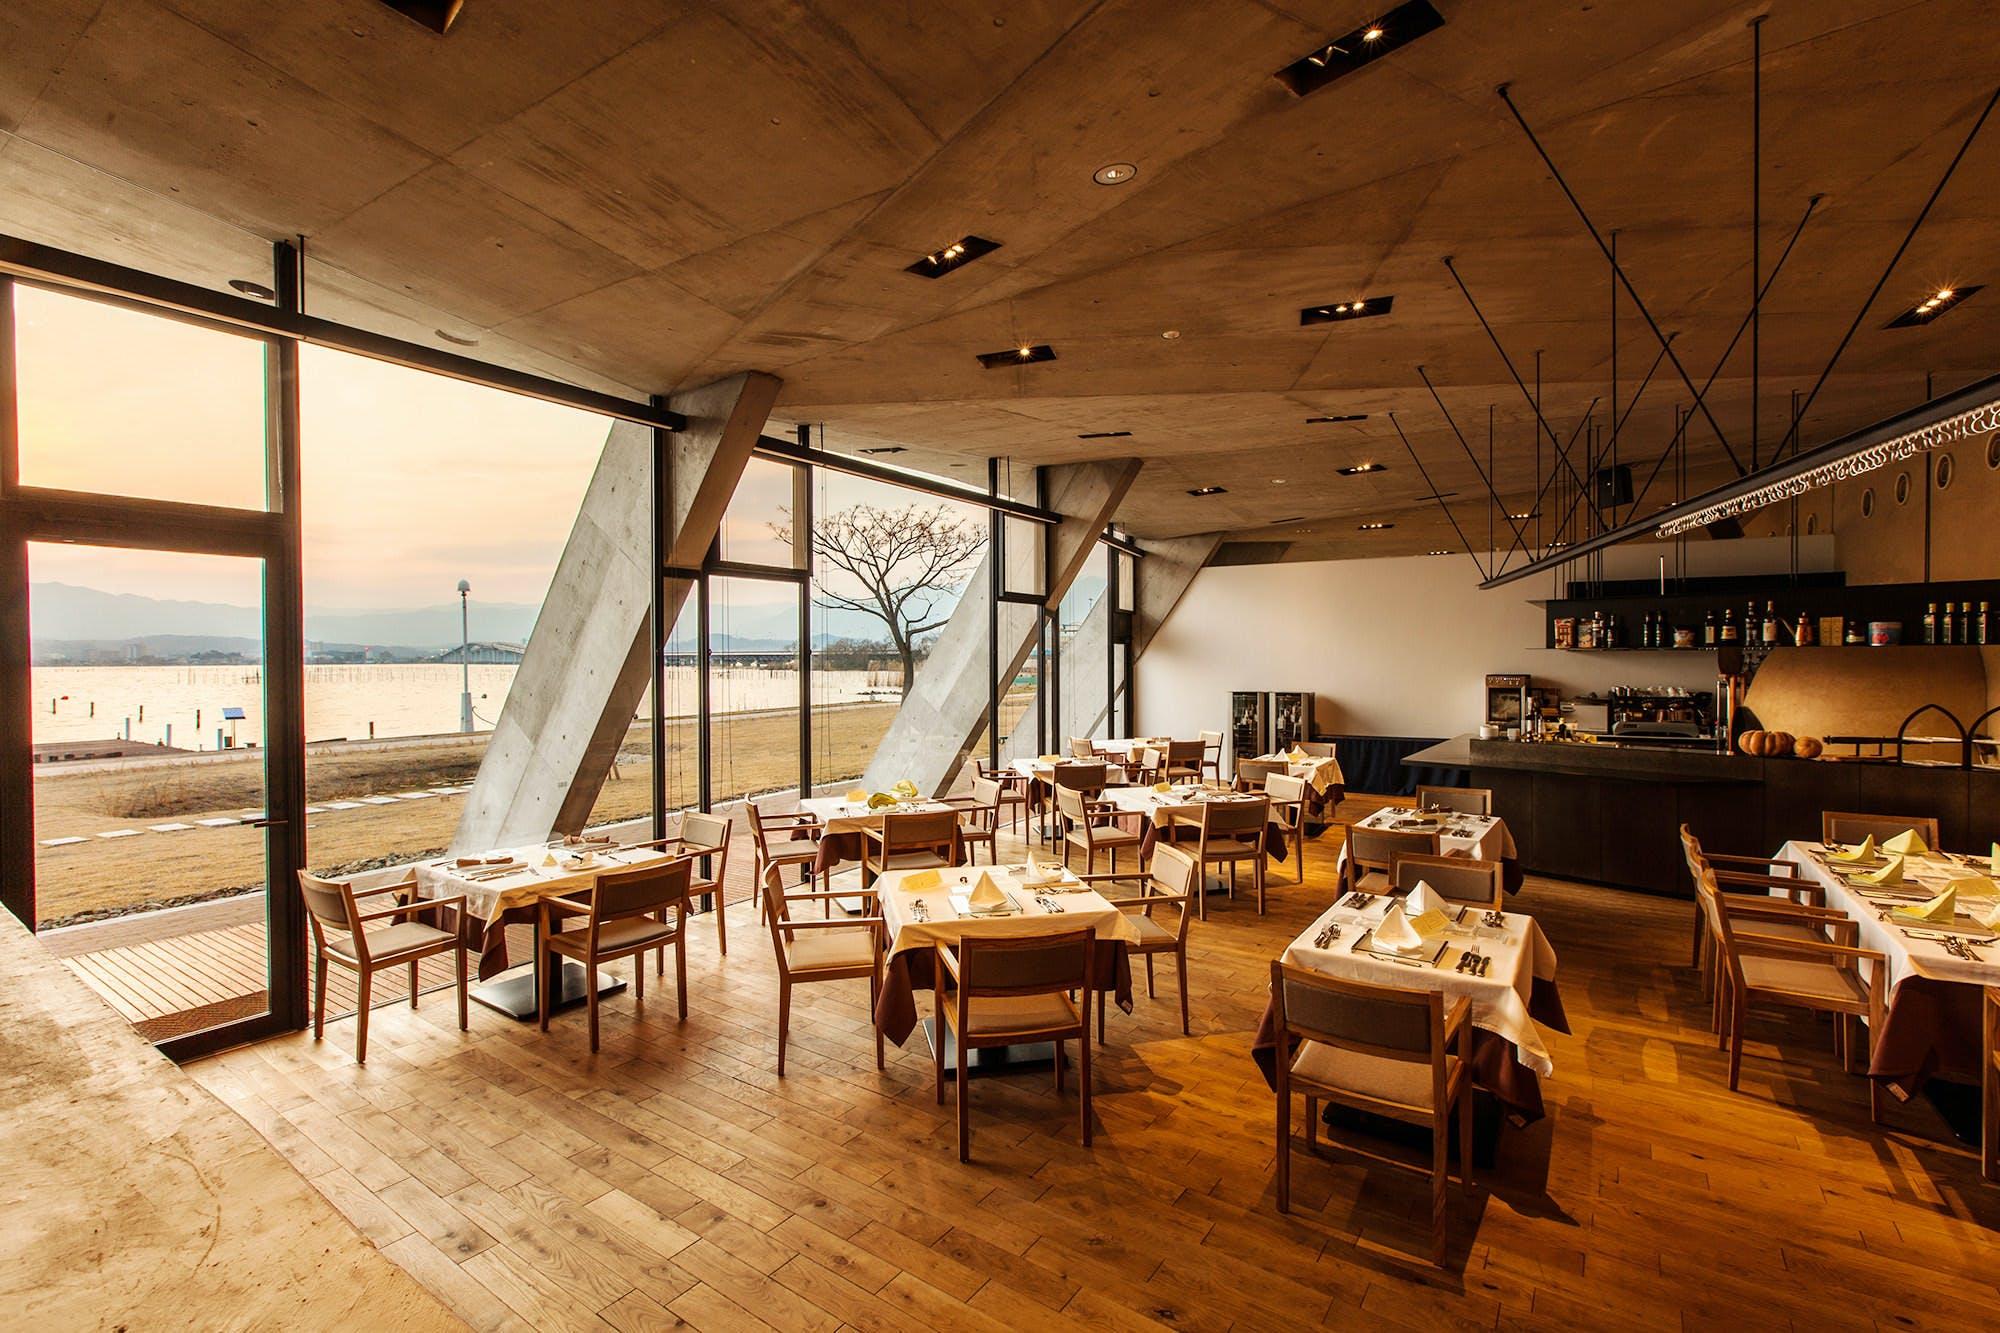 DINING ROOM BY THE BIWAKO/セトレ マリーナびわ湖